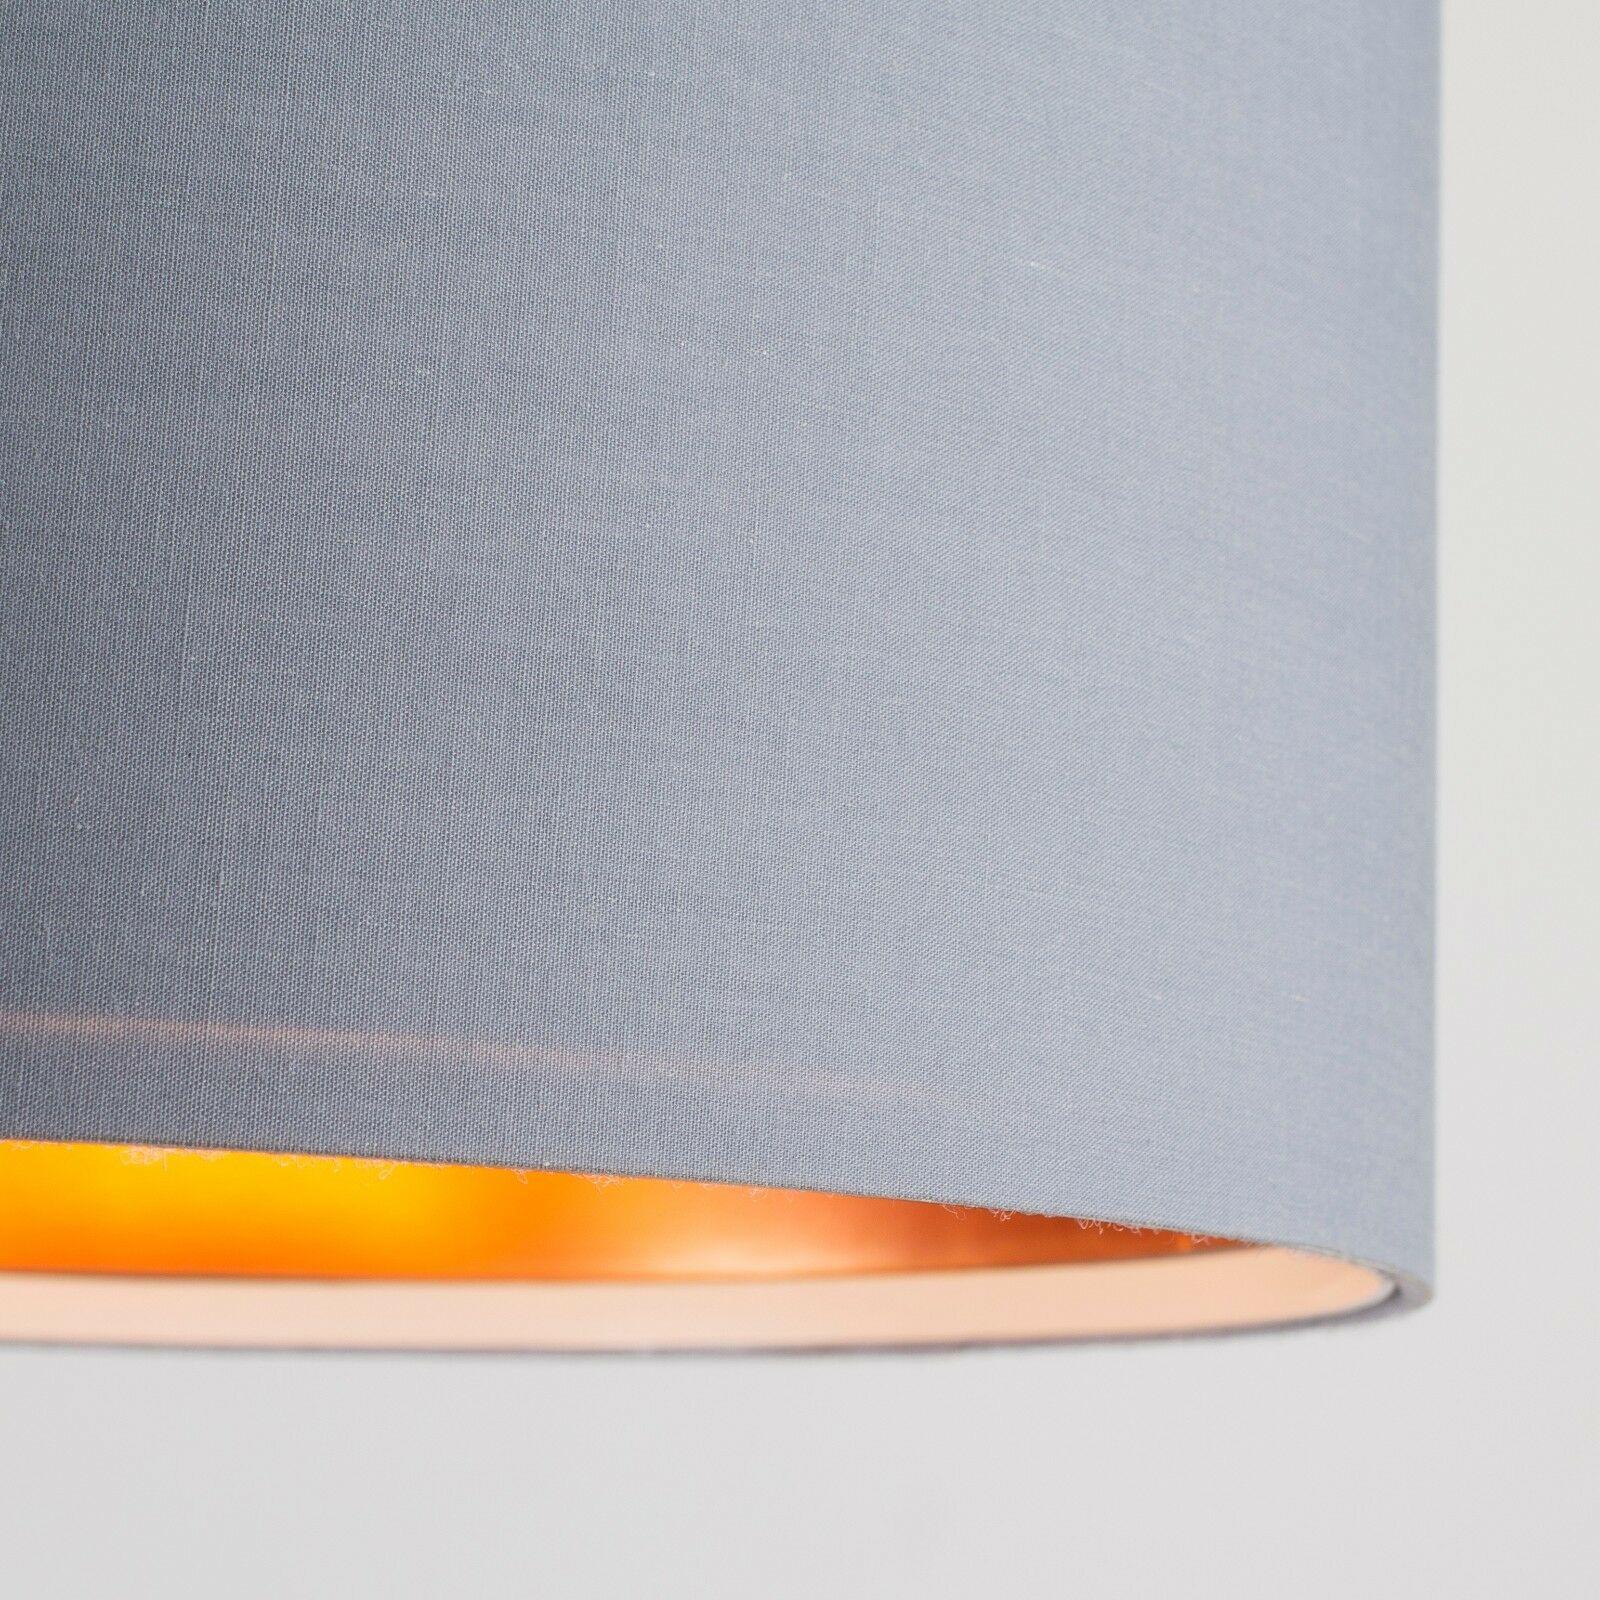 Tela-moderna-algodon-facil-ajuste-Techo-Colgante-Pantalla-De-Mesa-tonos-de-luz-de-tambor miniatura 133